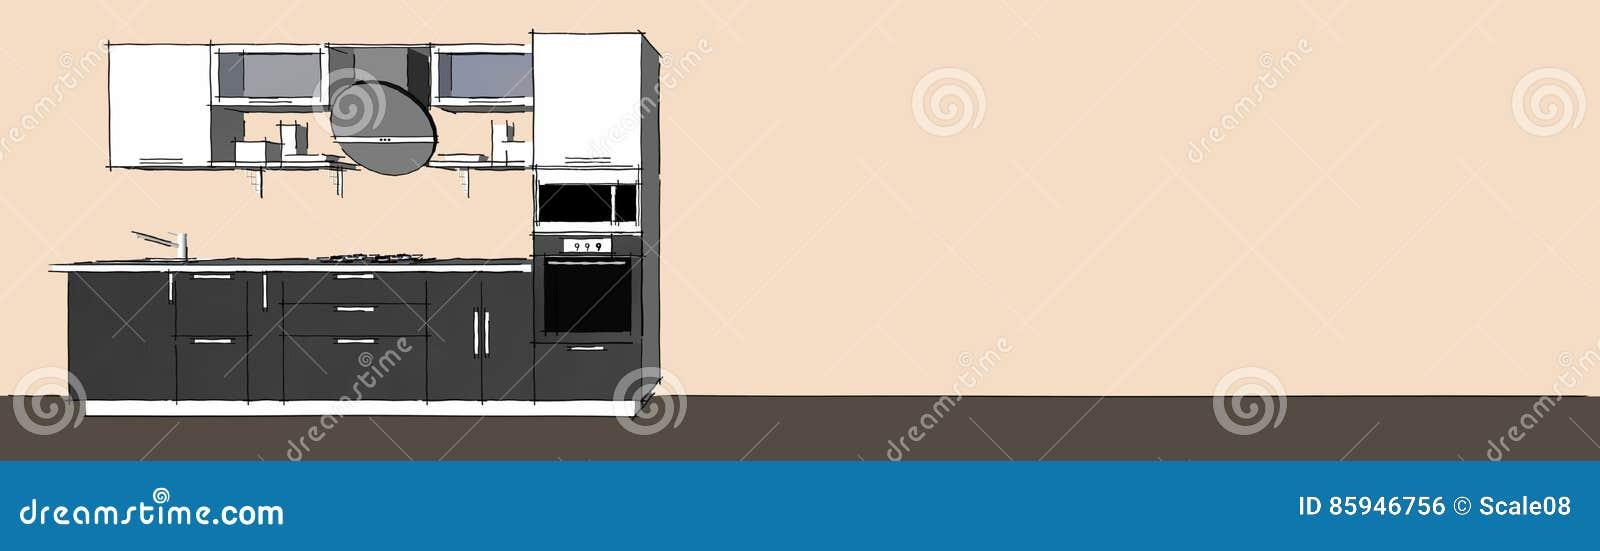 Beautiful Disegnare La Cucina In 3d Ideas - Embercreative.us ...